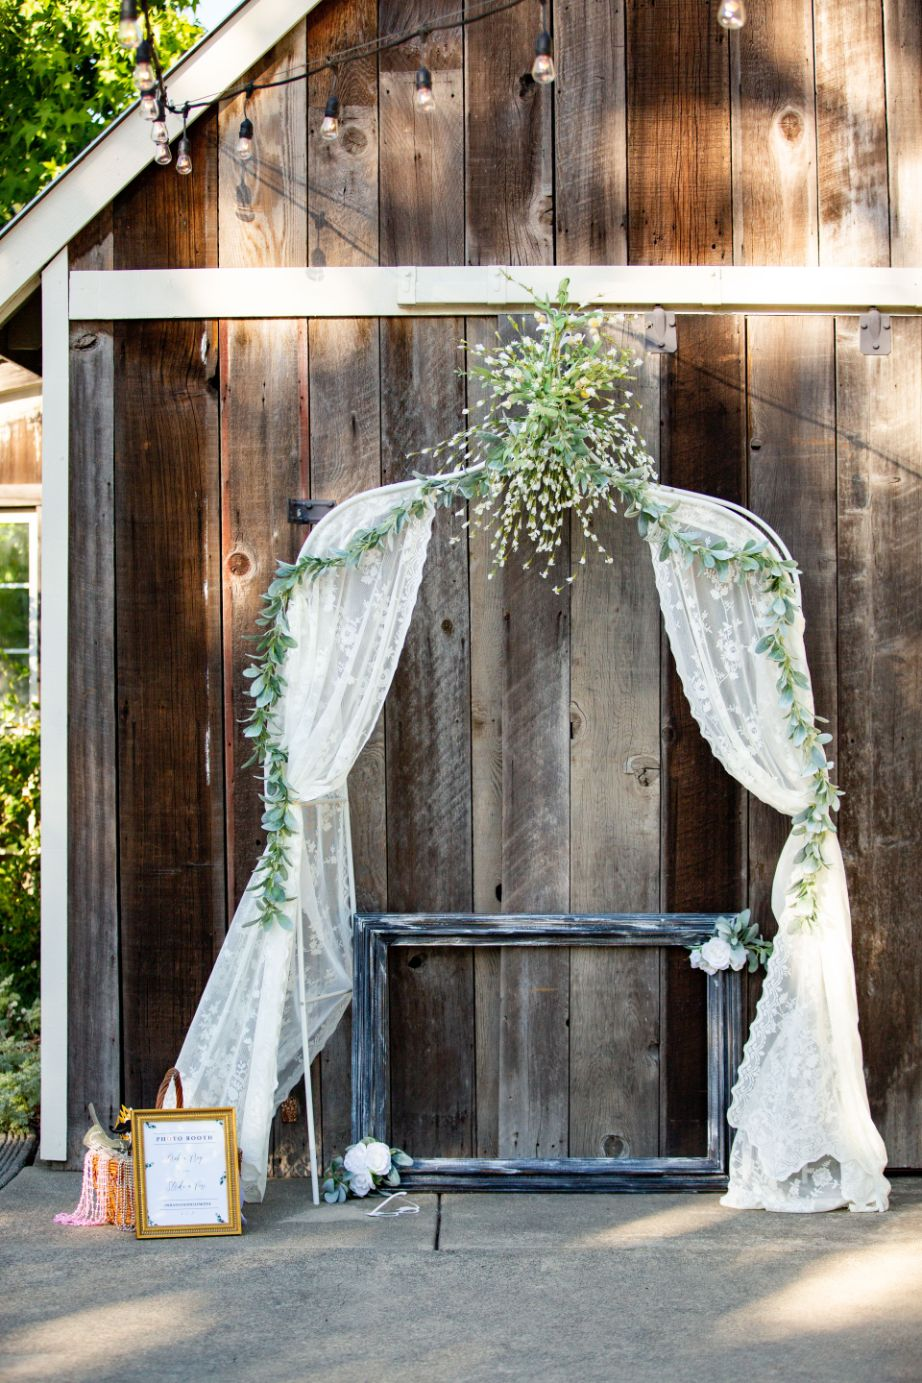 32 photo opportunities rustic mountain house estate weddingi venues northern california